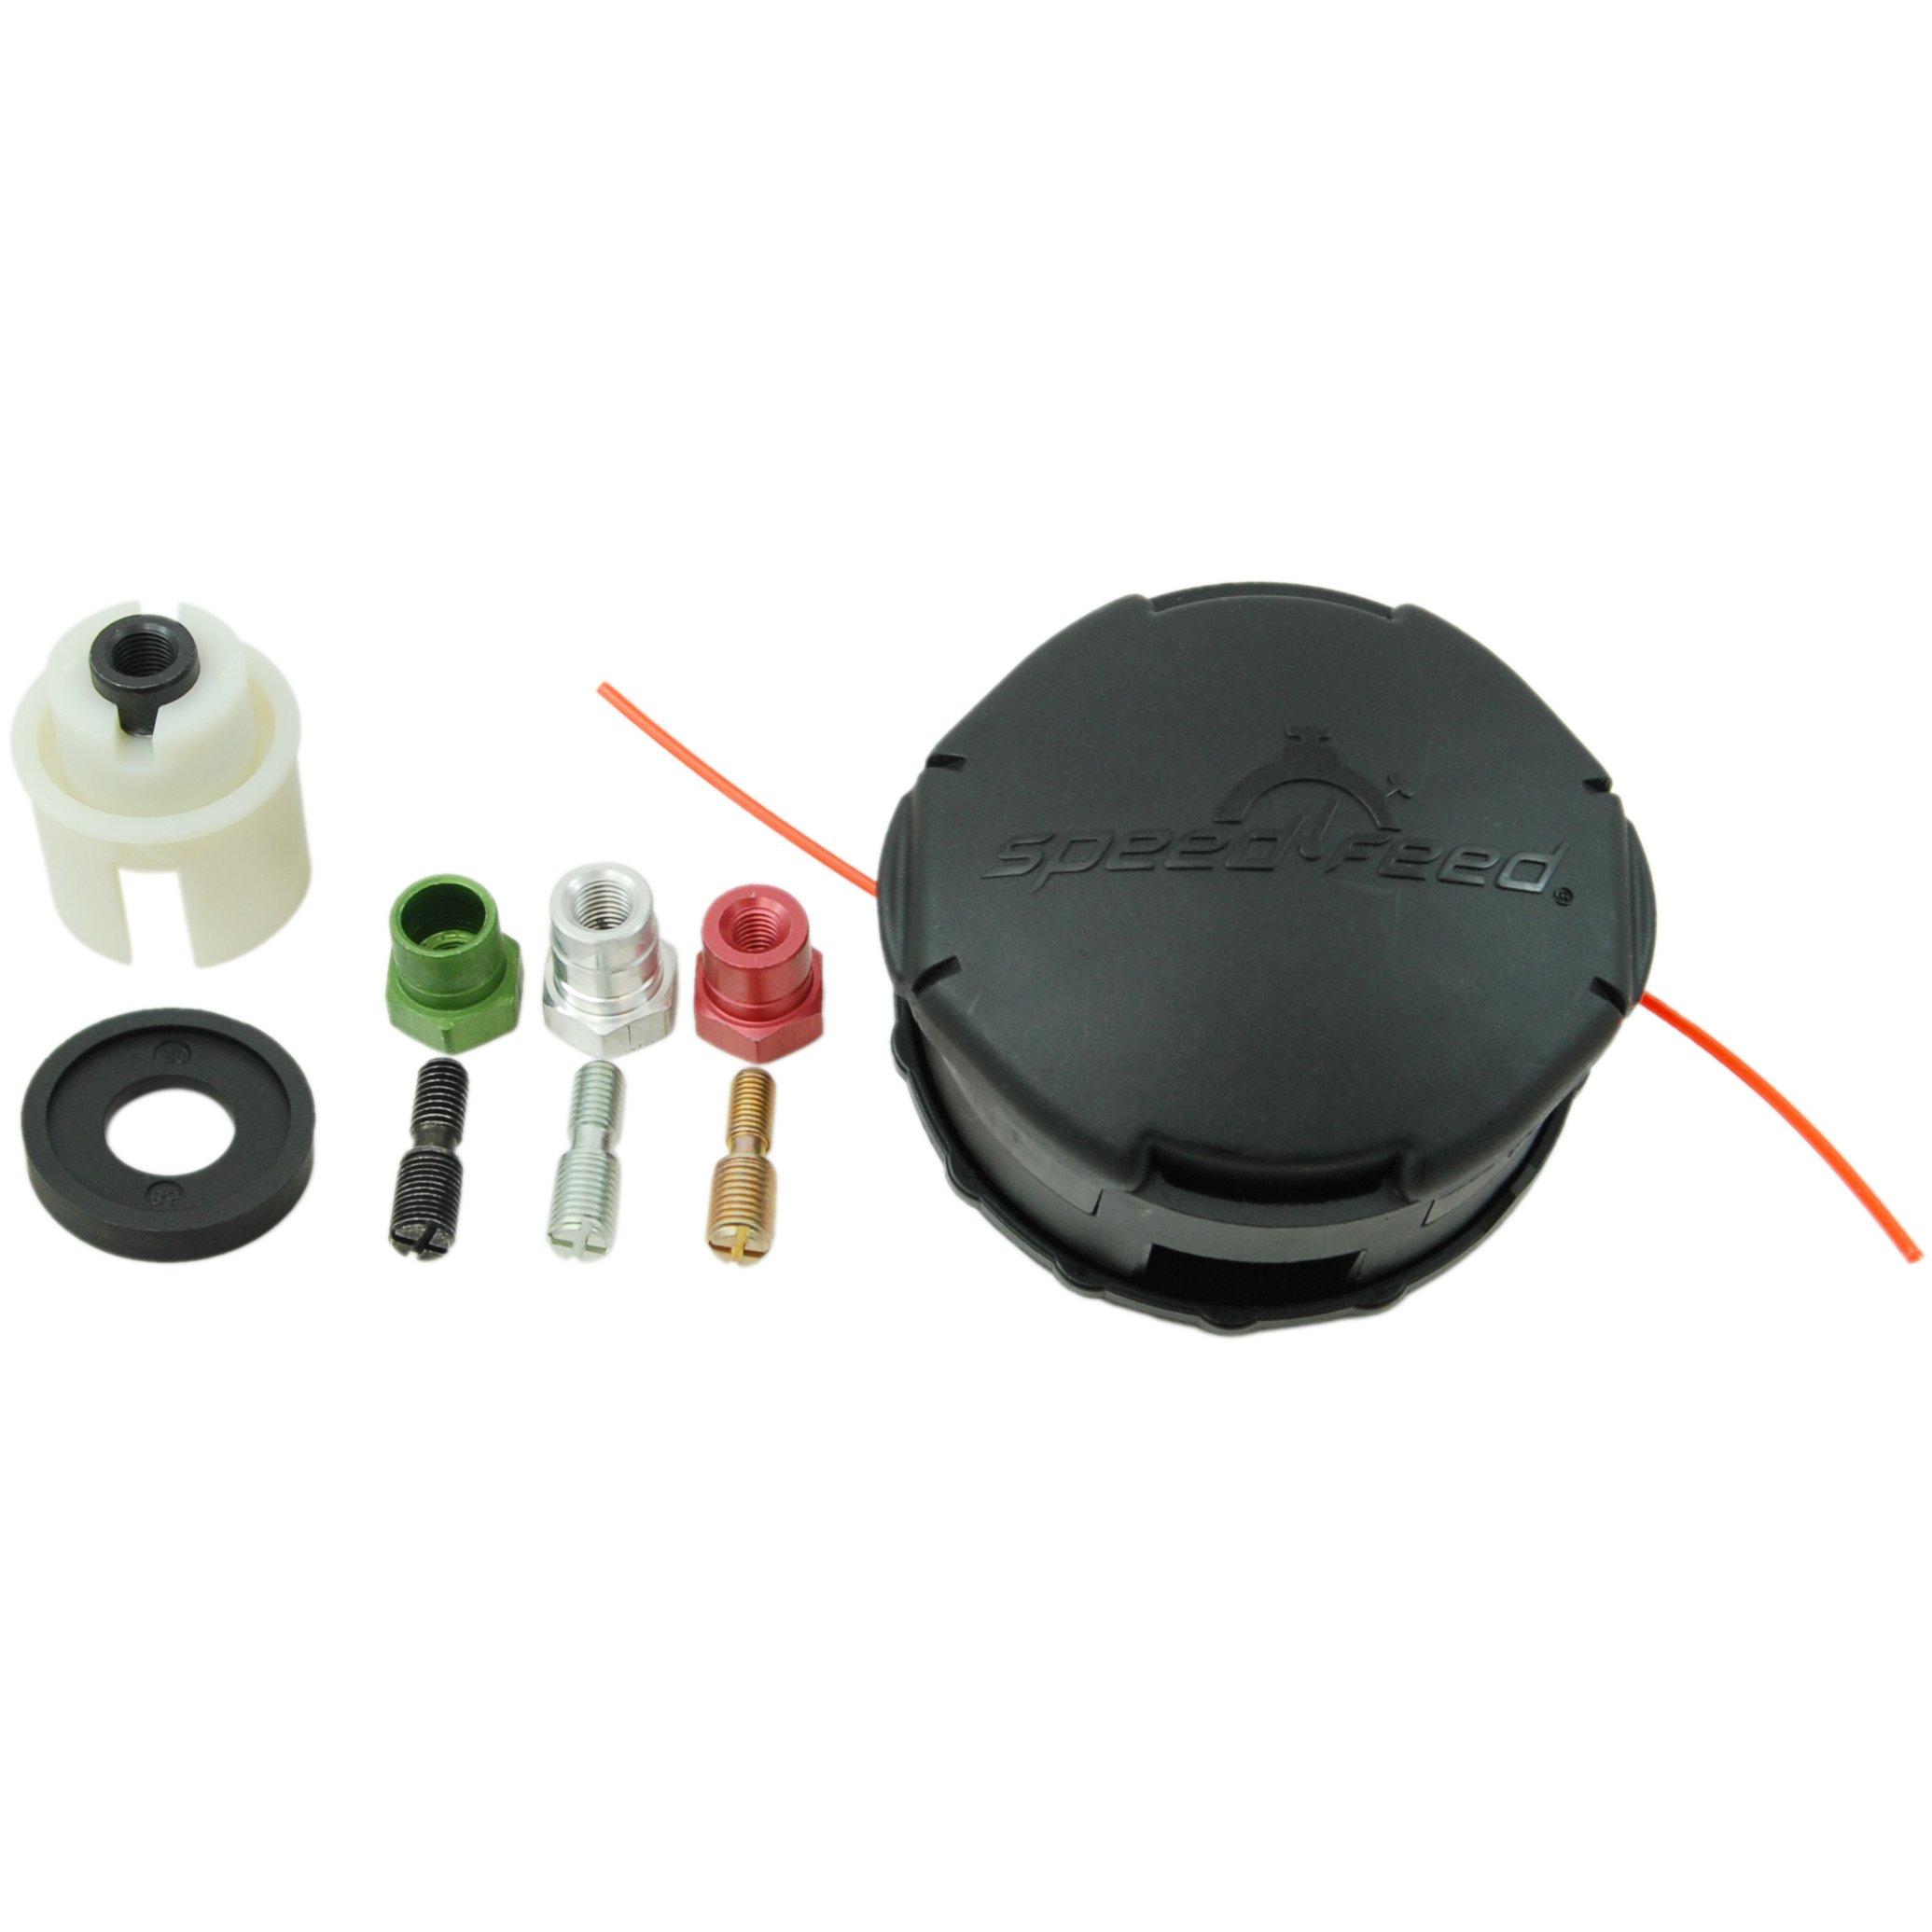 Echo 99944200907 Speed-Feed 400 Universal Trimmer Head